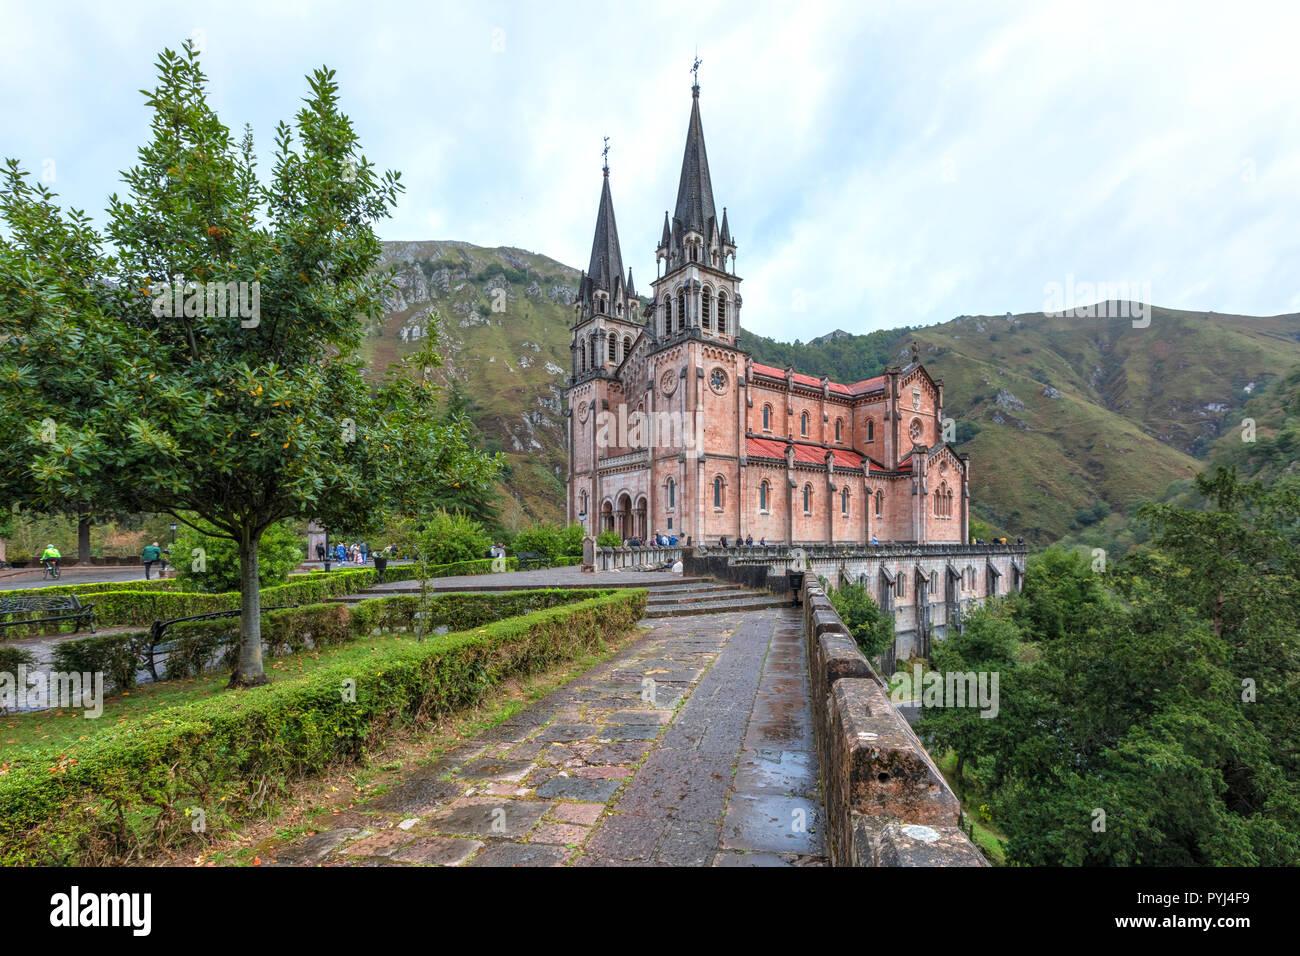 Covadonga, Picos de Europa, Asturias, Spain, Europe - Stock Image